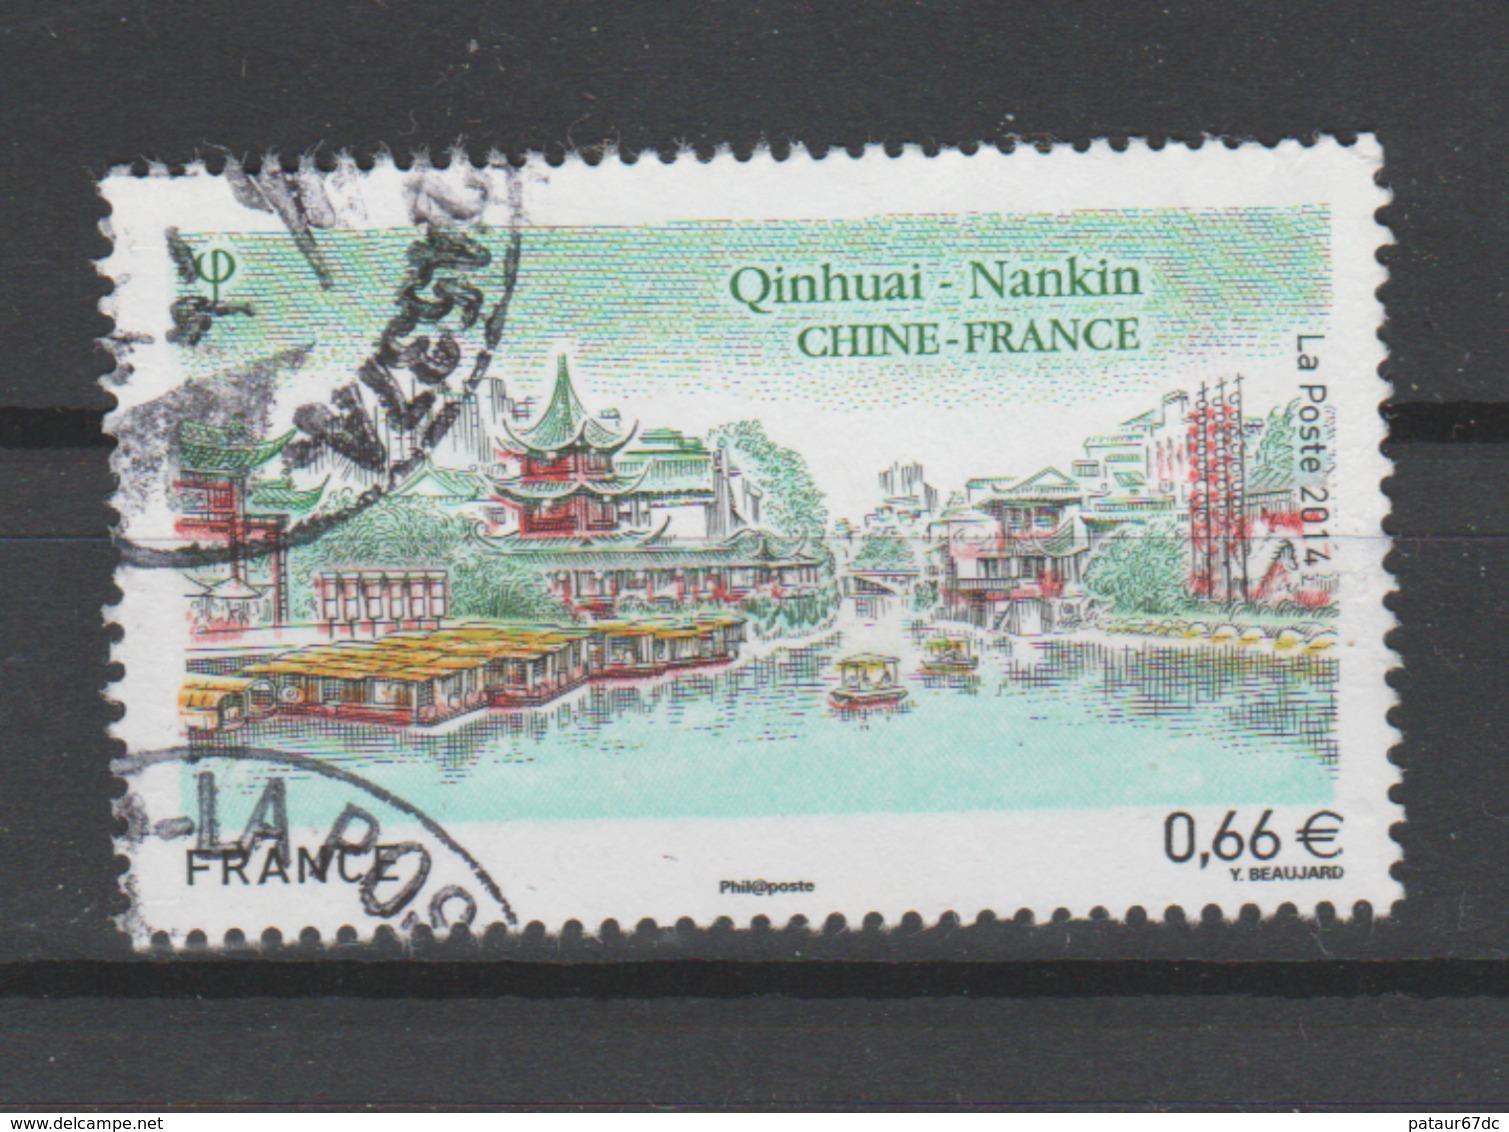 FRANCE / 2014 / Y&T N° 4847 : France - Chine (Nankin) - Choisi - Cachet Rond - France